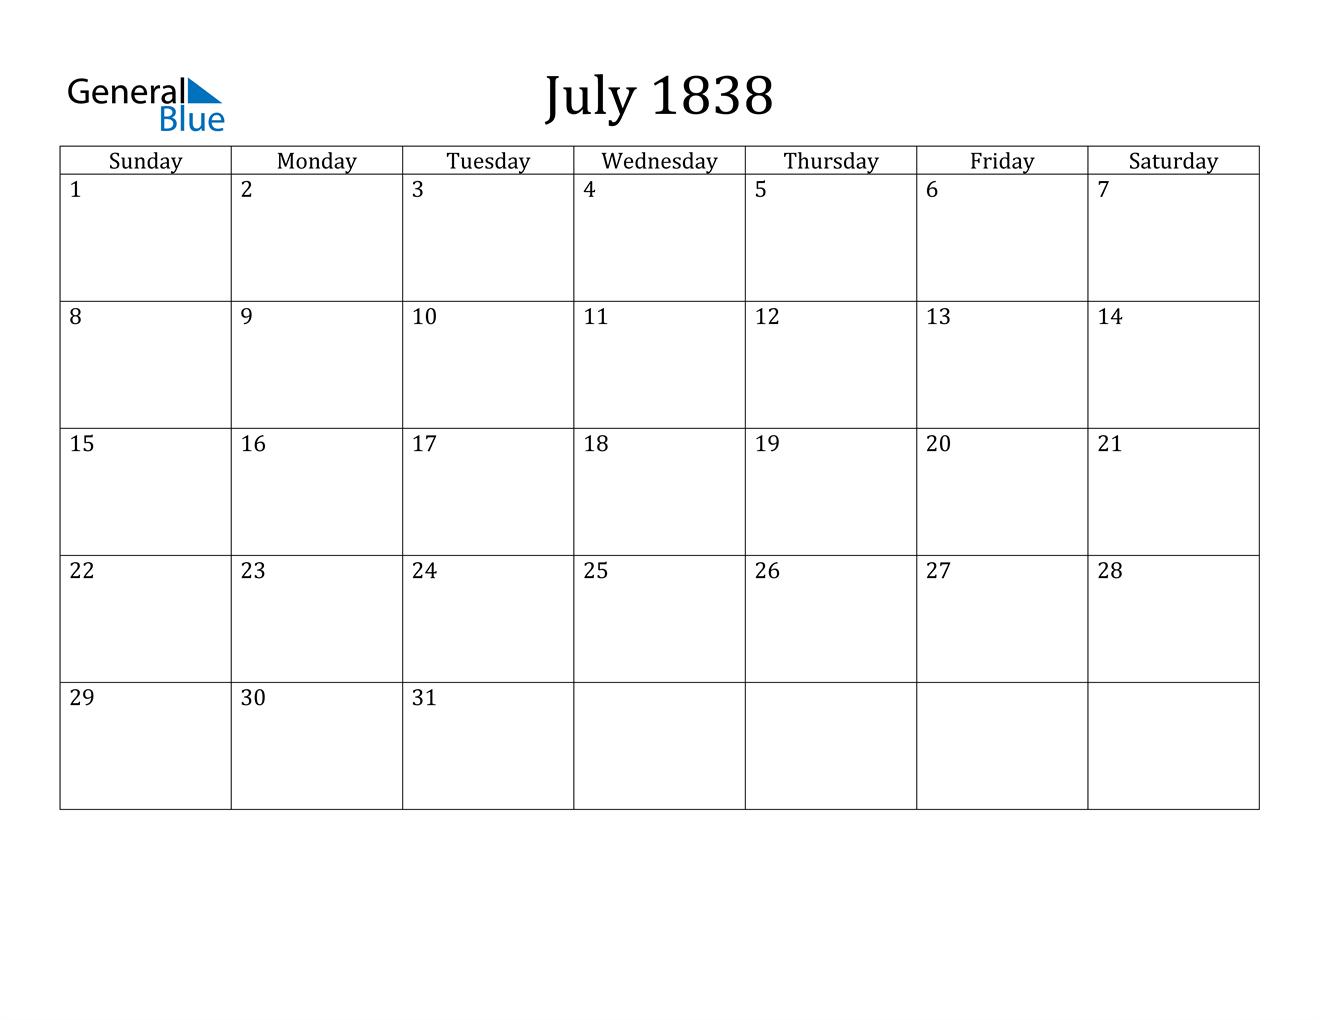 Image of July 1838 Calendar